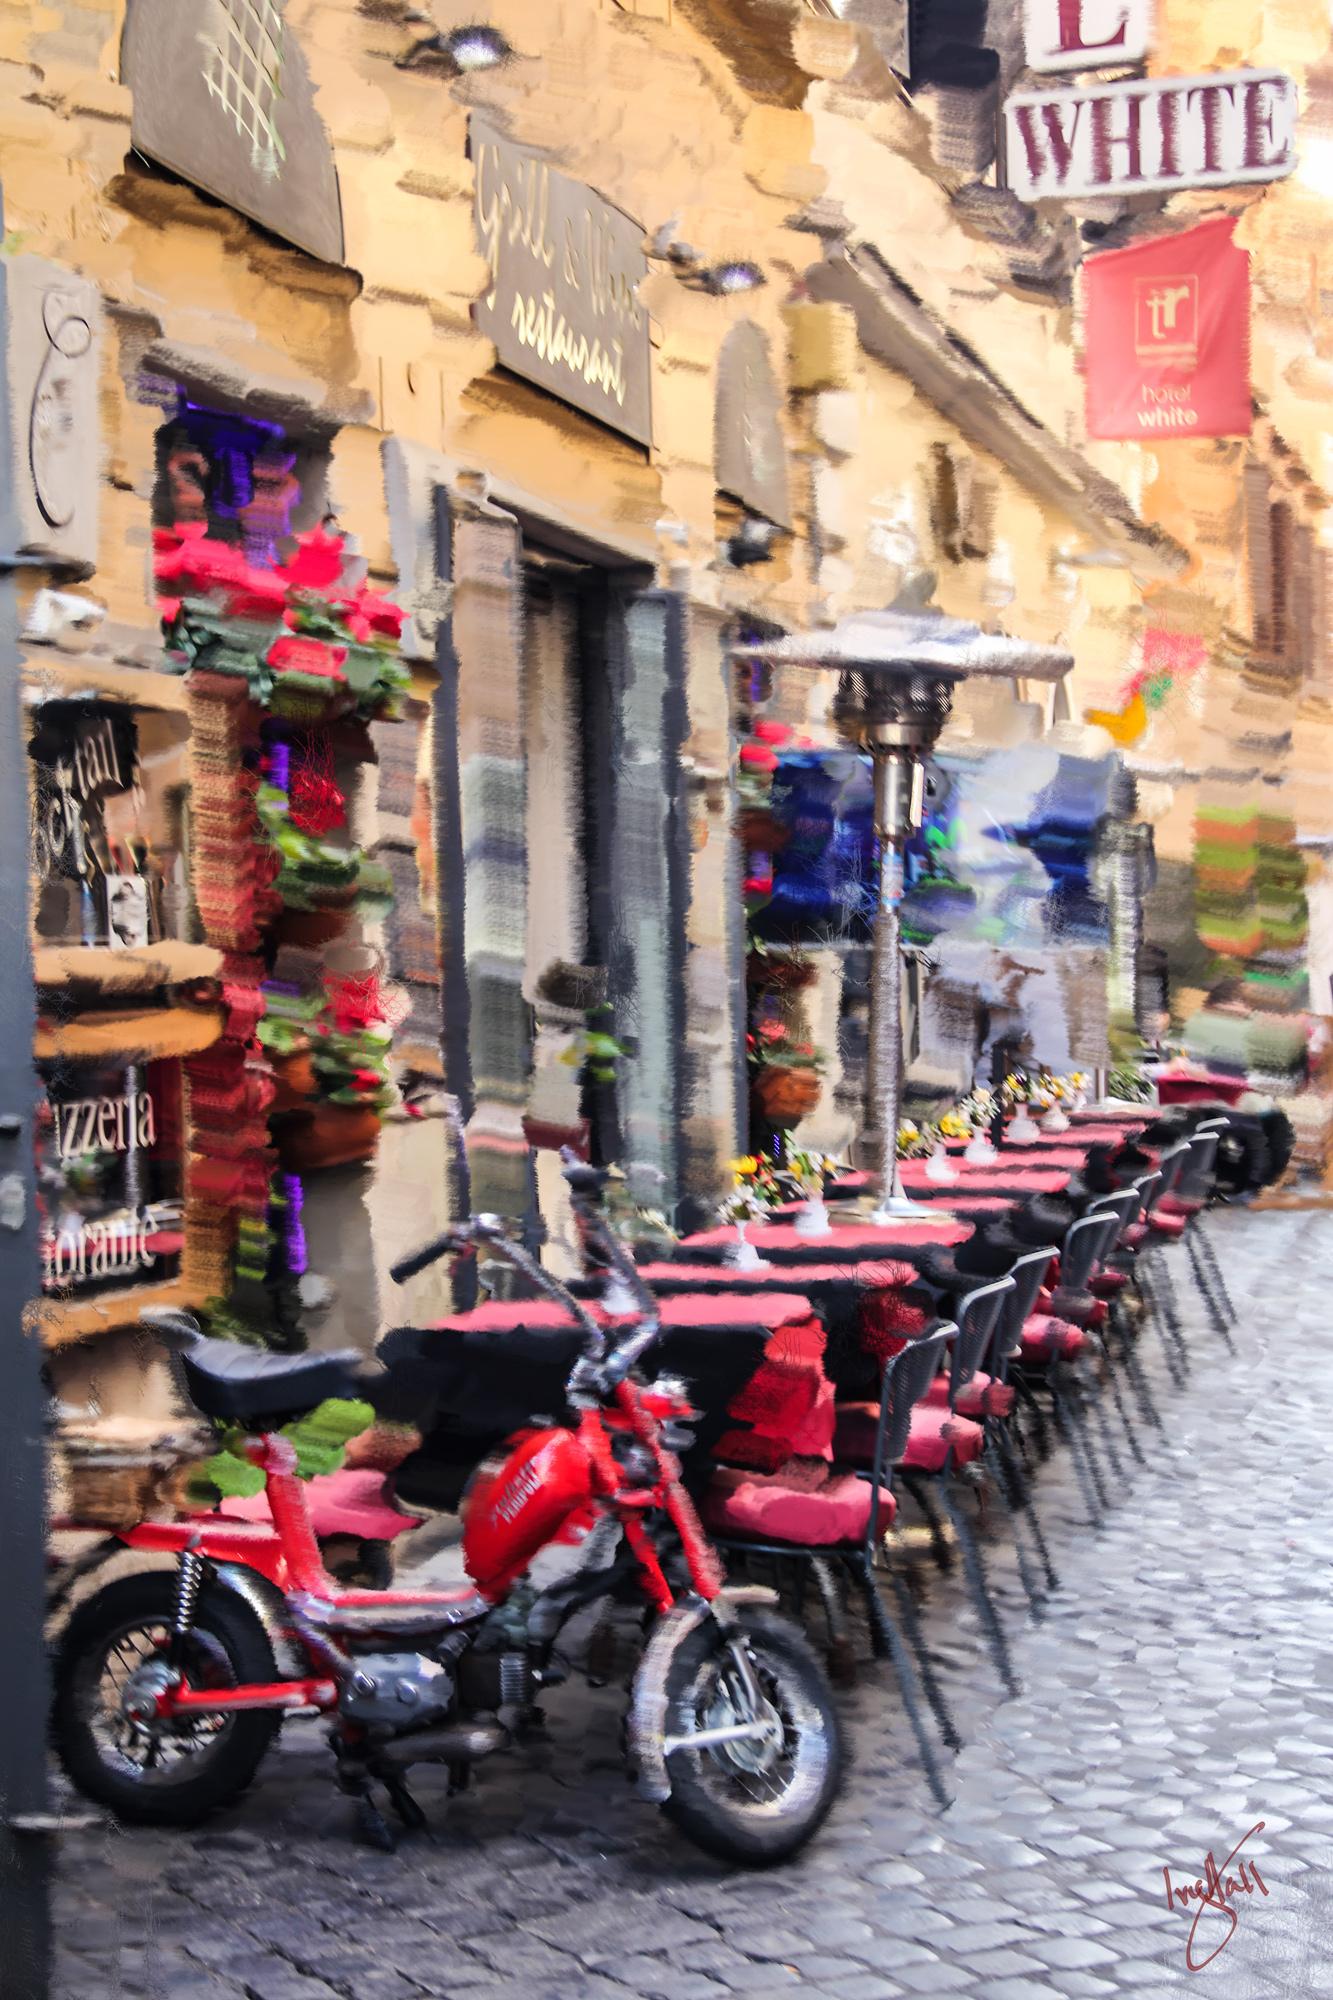 030_Rome_063_P.jpg